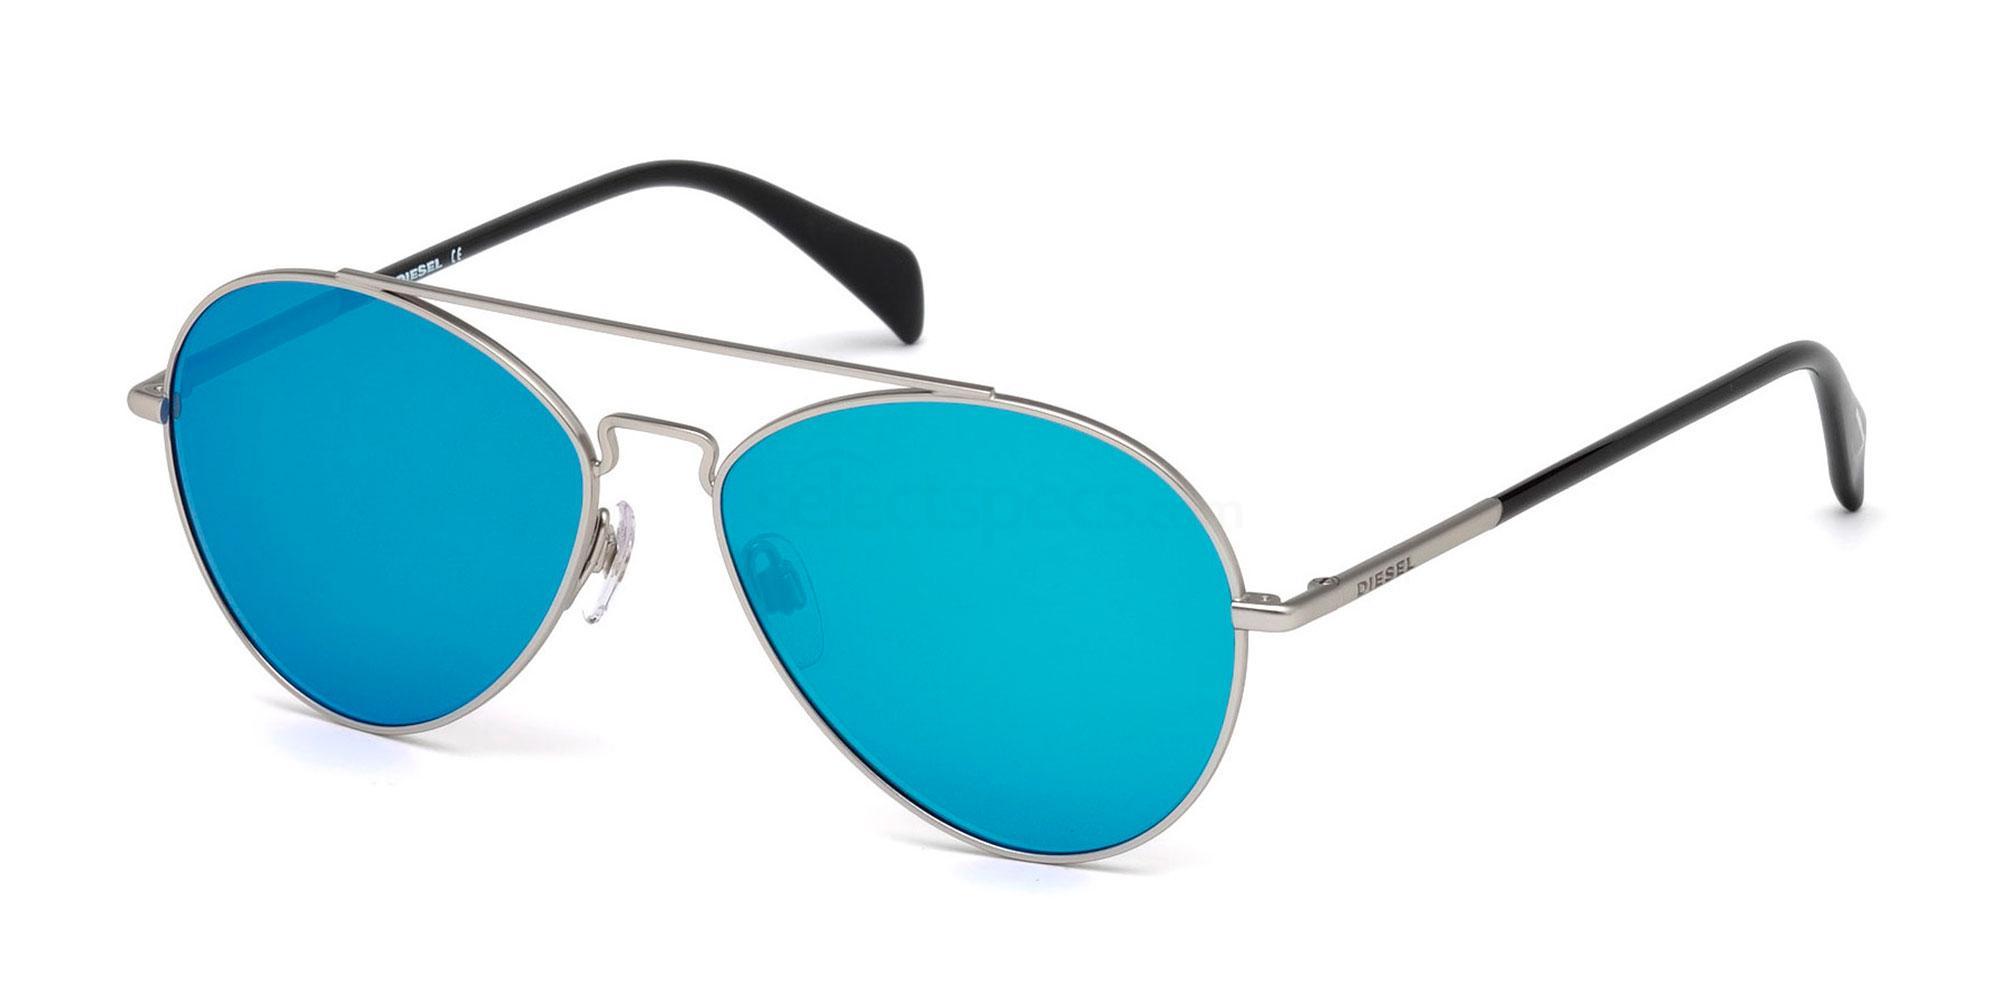 17X DL0193 Sunglasses, Diesel